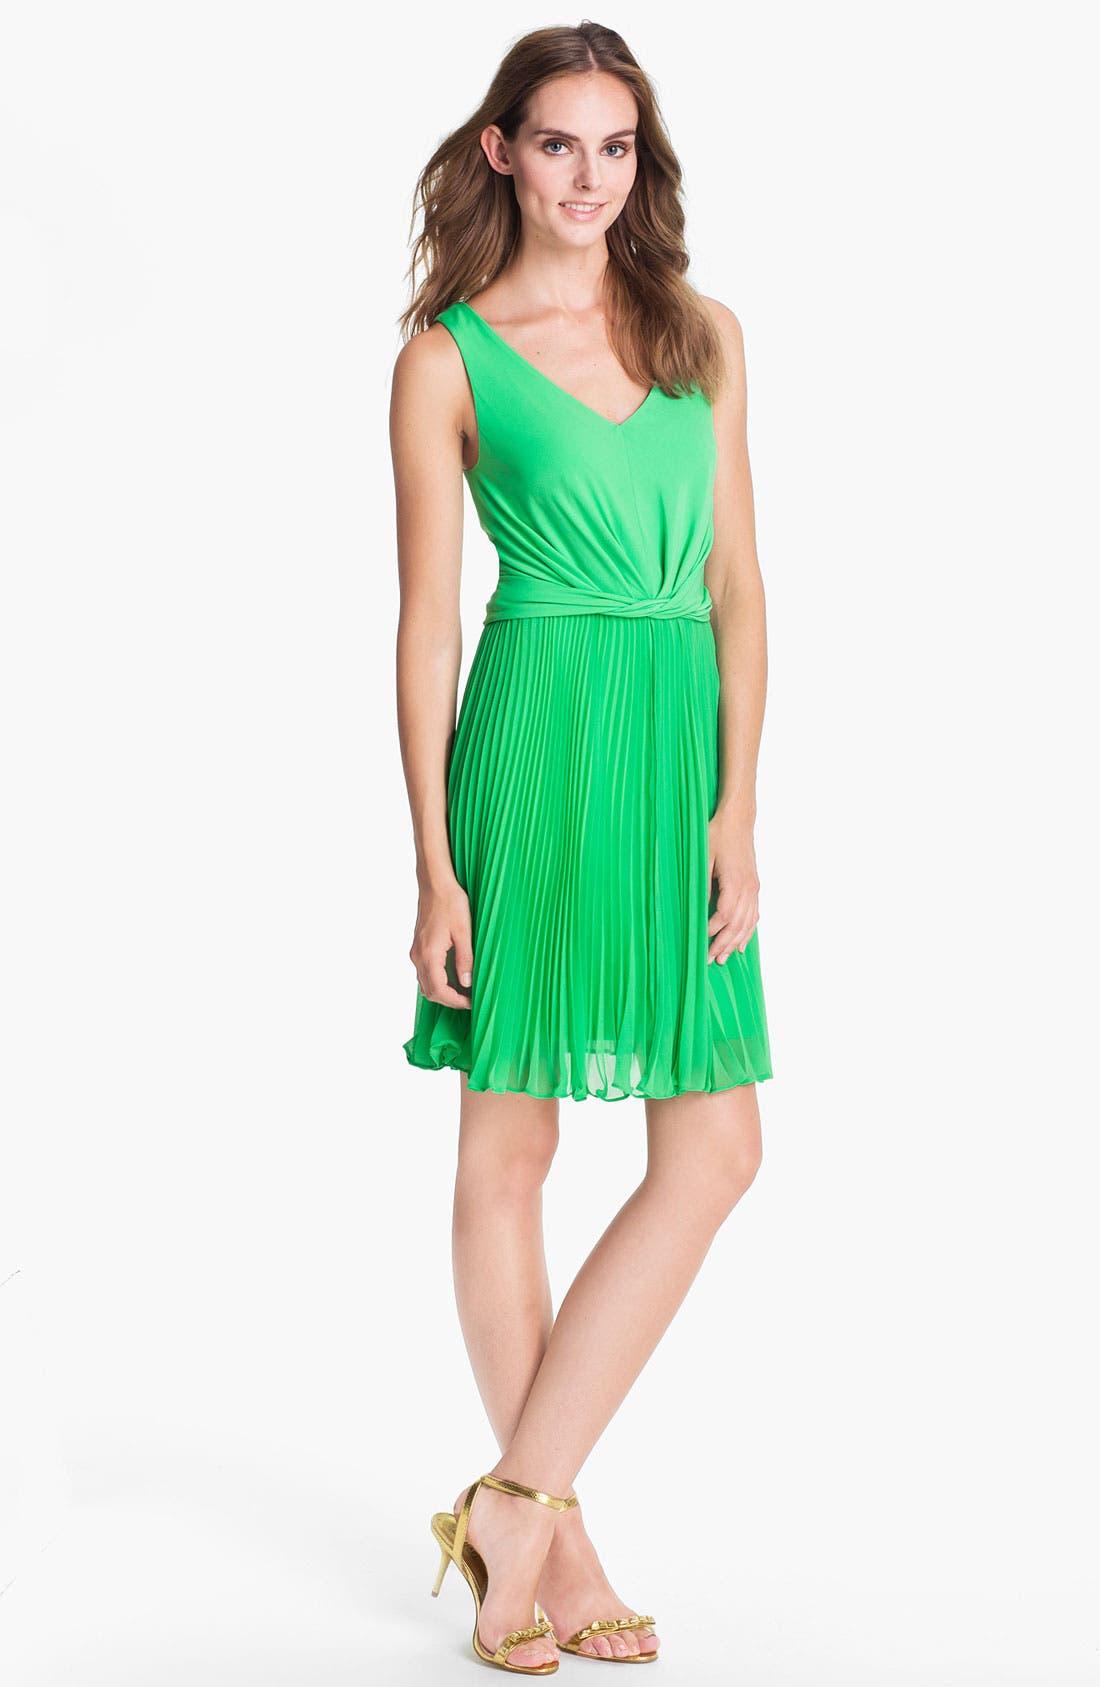 Main Image - Suzi Chin for Maggy Boutique Pleated Chiffon Dress